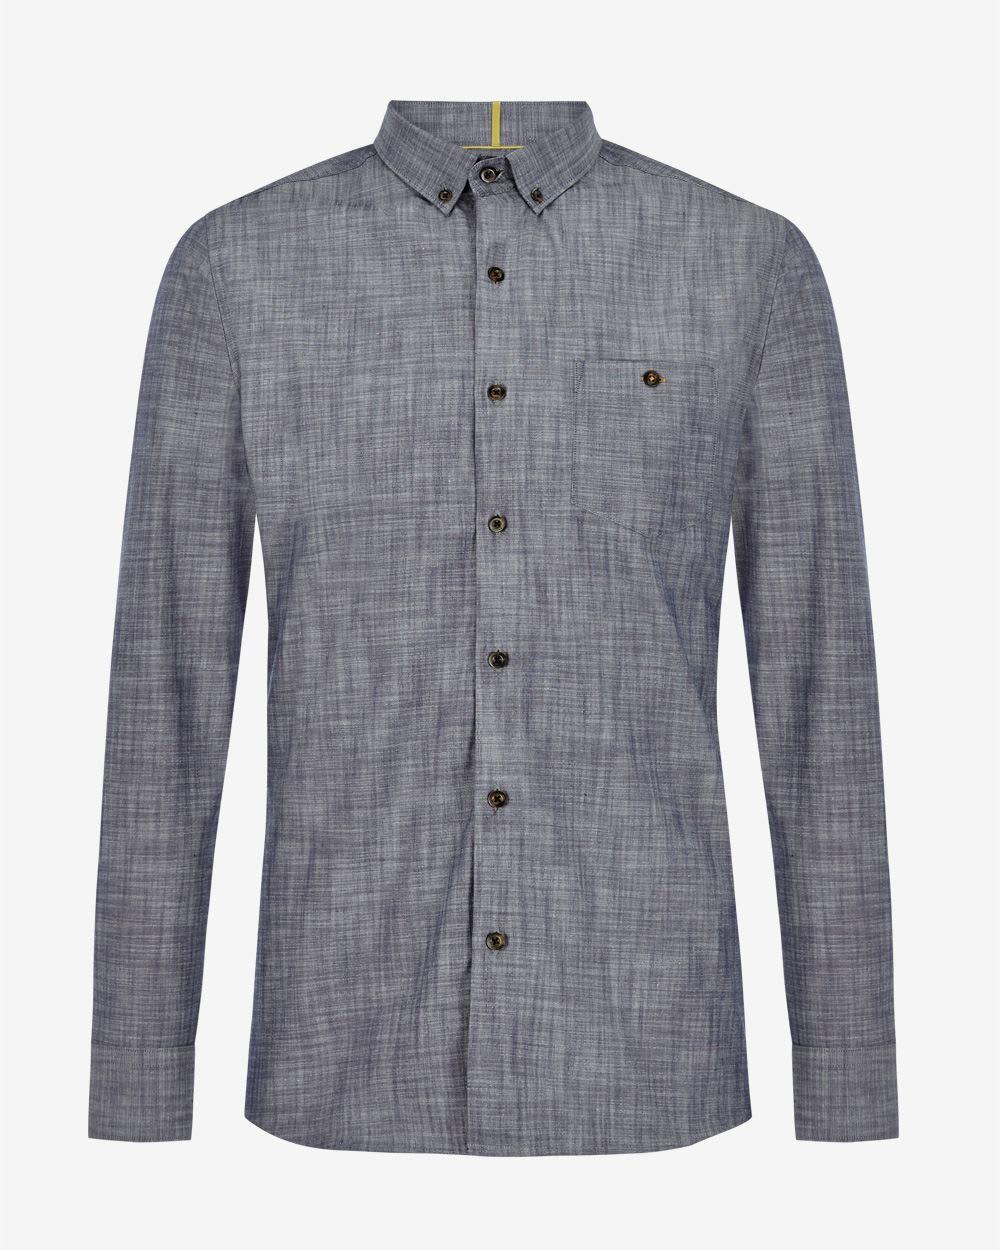 bfeec2ab5f Dark navy chambray Tailored fit shirt | RW&CO.